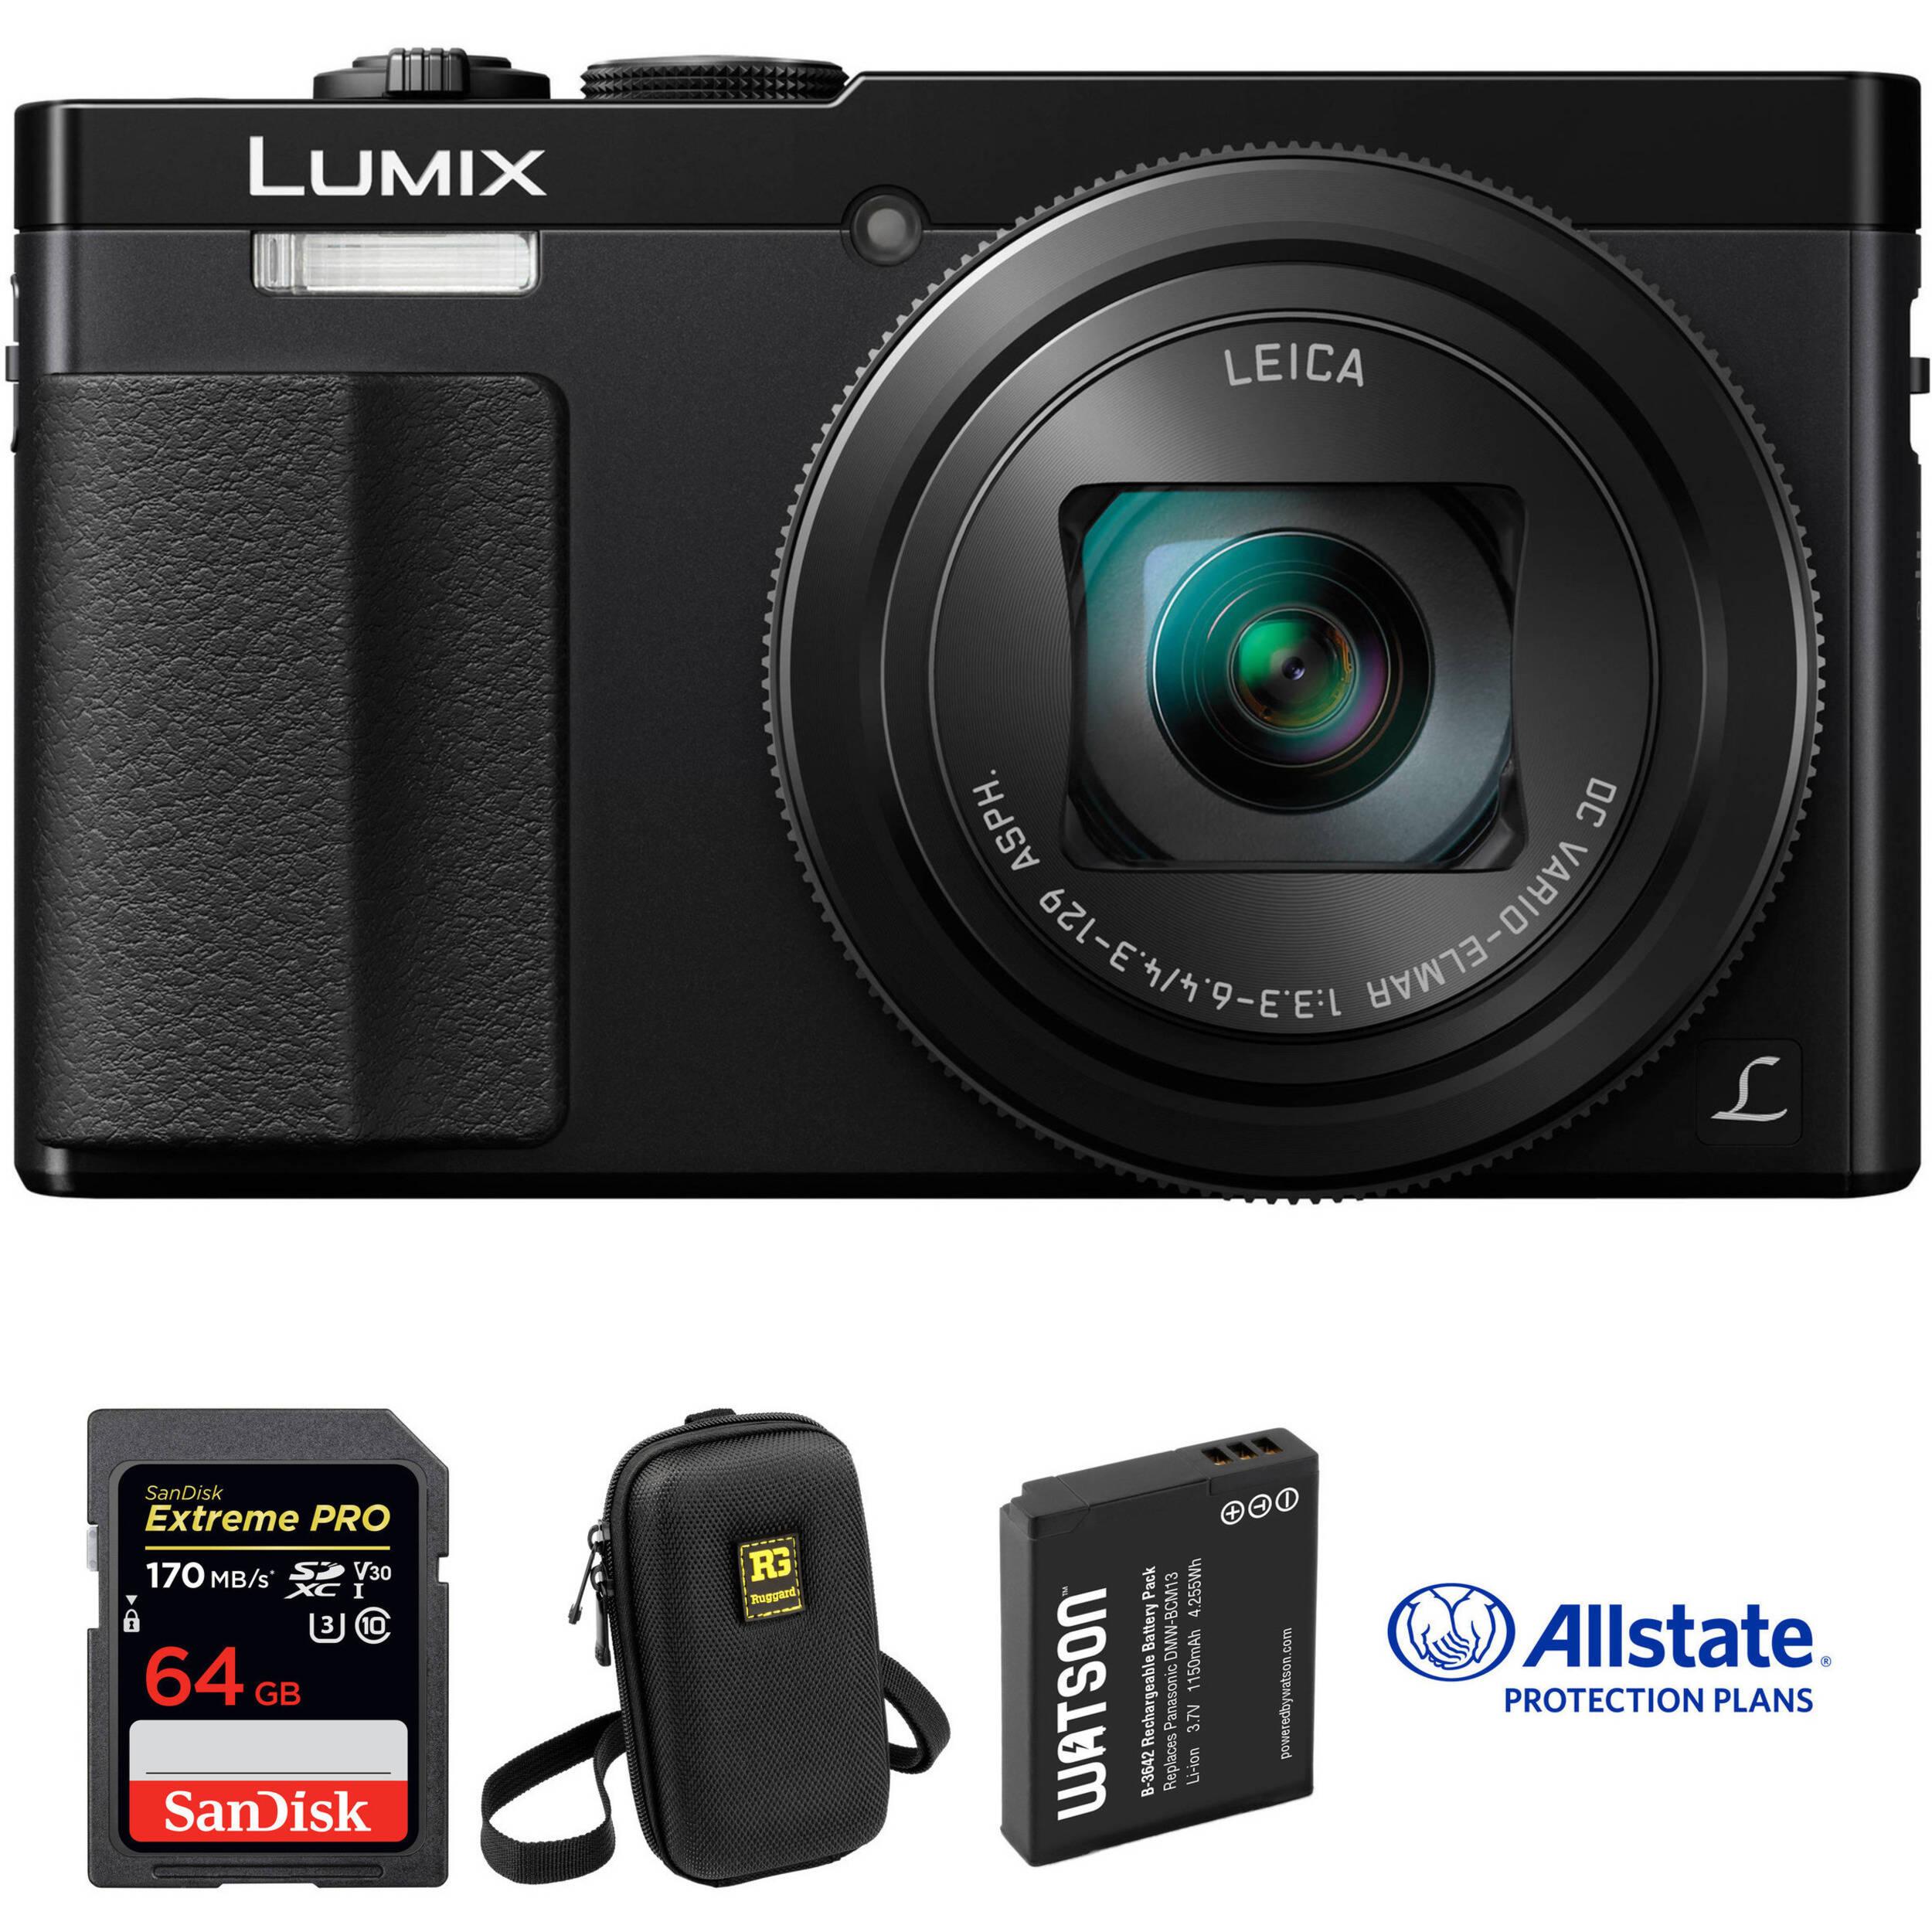 Panasonic lumix dmc tz70 tz71 zs50 service manual and.